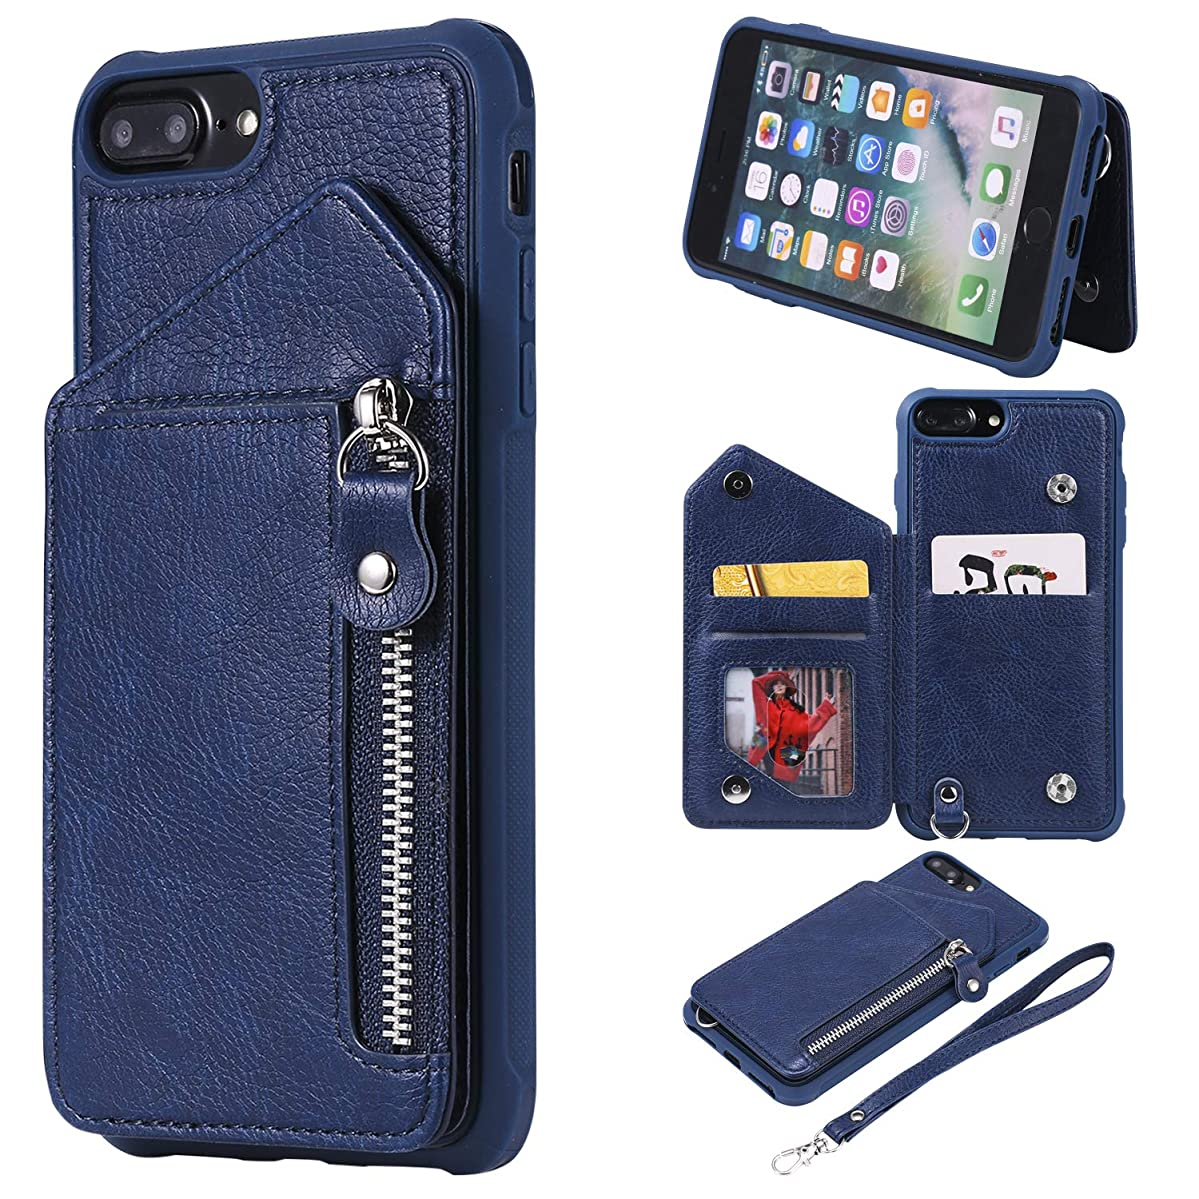 Tznzxm iPhone 8 Plus Case, iPhone 7 Plus Case, PU Leather Flip Zipper Wallet with Card Slot Magnetic Purse Wrist Protective Anti-Scratch Shock Absorption Kickstand Case for iPhone 7 Plus /8 Plus Blue